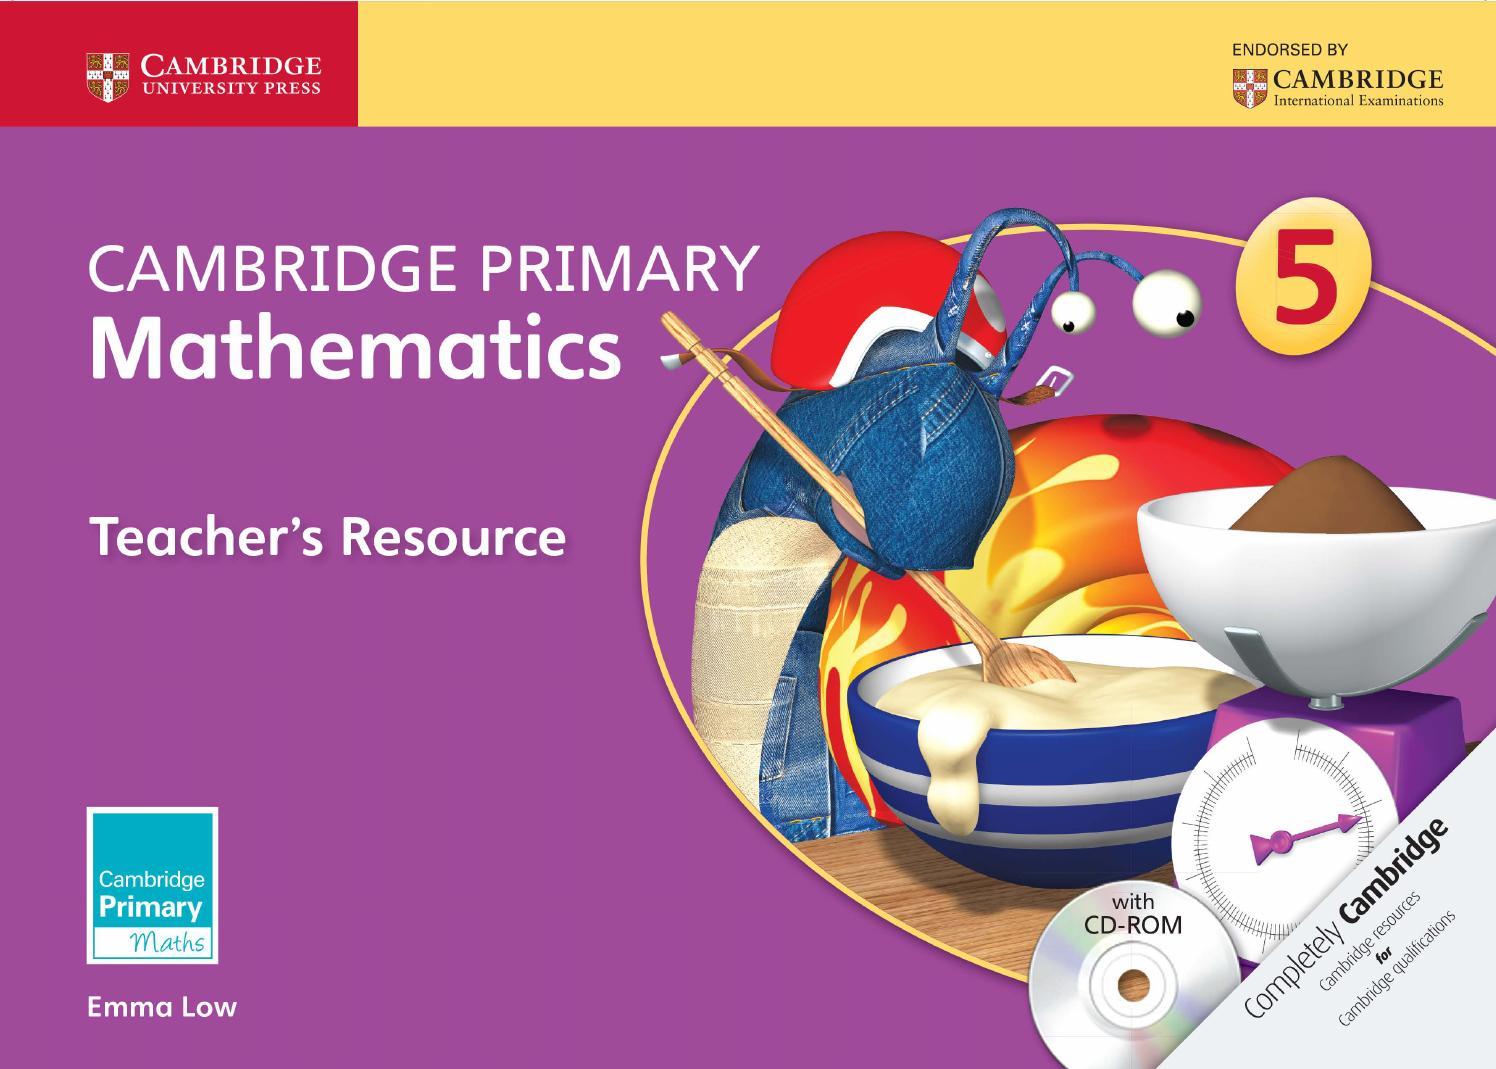 hight resolution of Cambridge Primary Mathematics Teacher's Resource 5 by Cambridge University  Press Education - issuu